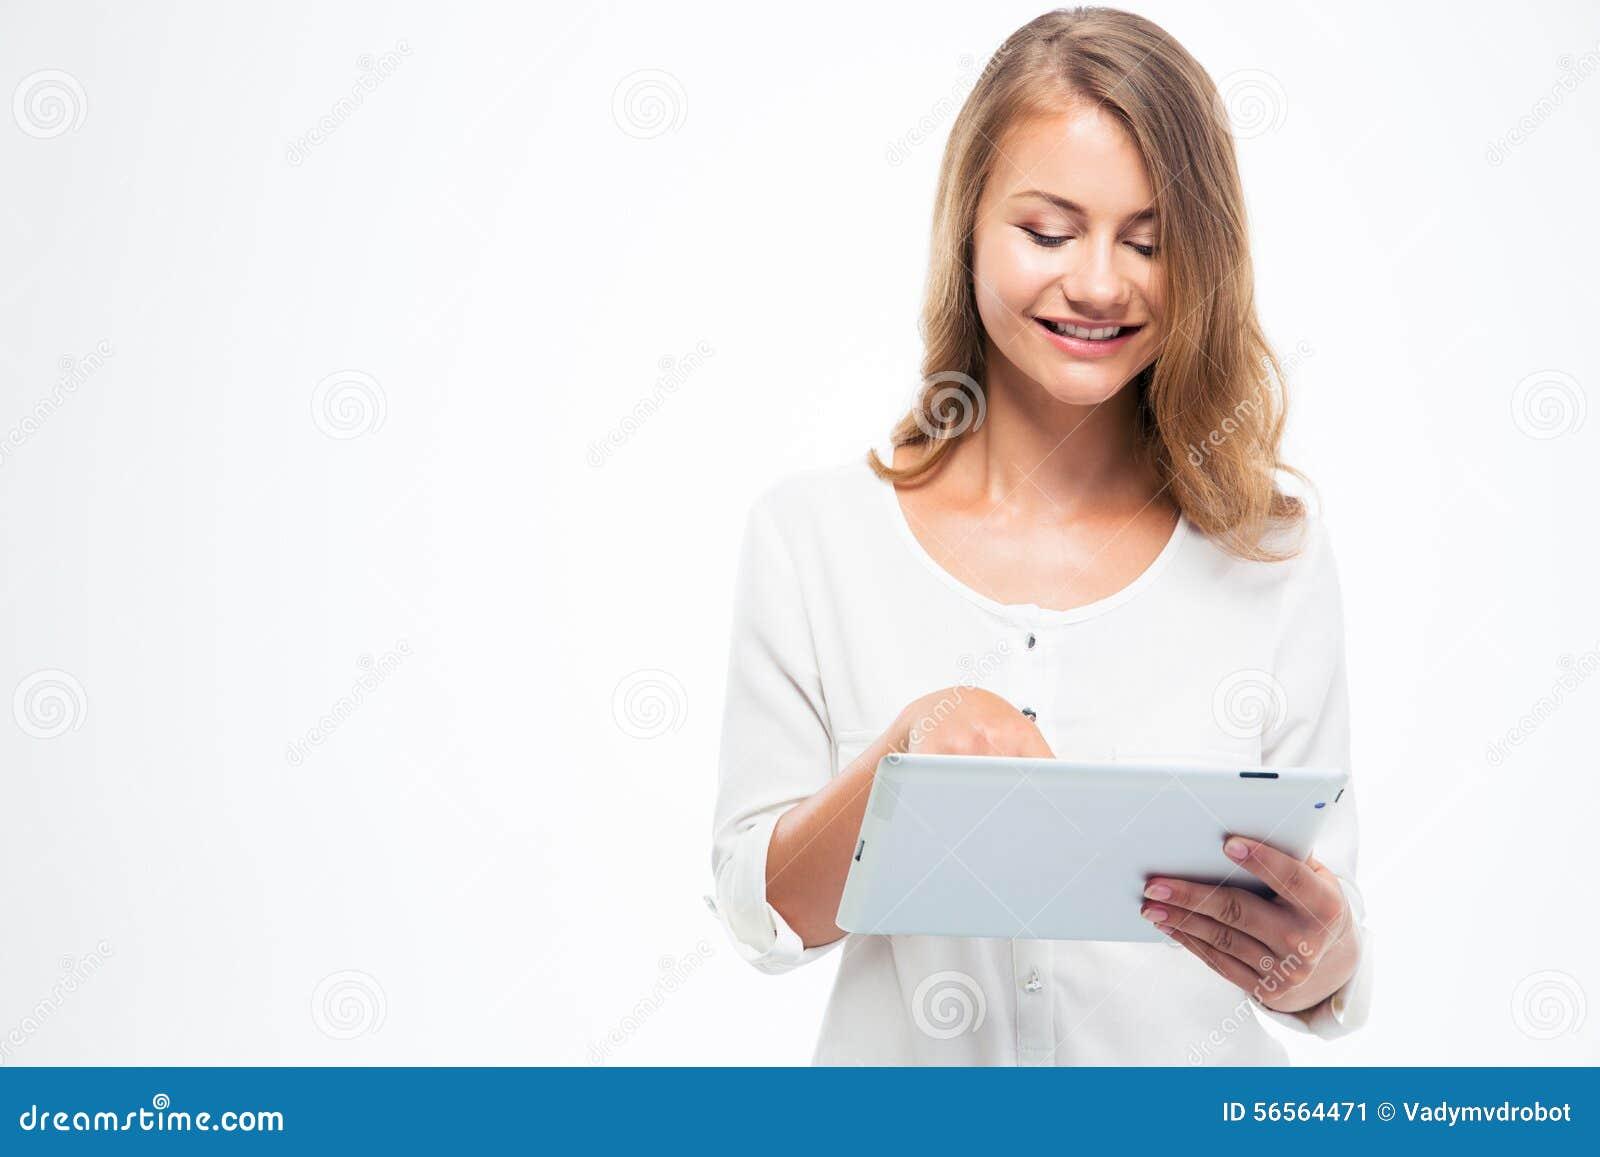 Download Γυναίκα σπουδαστής που χρησιμοποιεί το μαξιλάρι αφής Στοκ Εικόνα - εικόνα από πορτρέτο, ανασκόπησης: 56564471